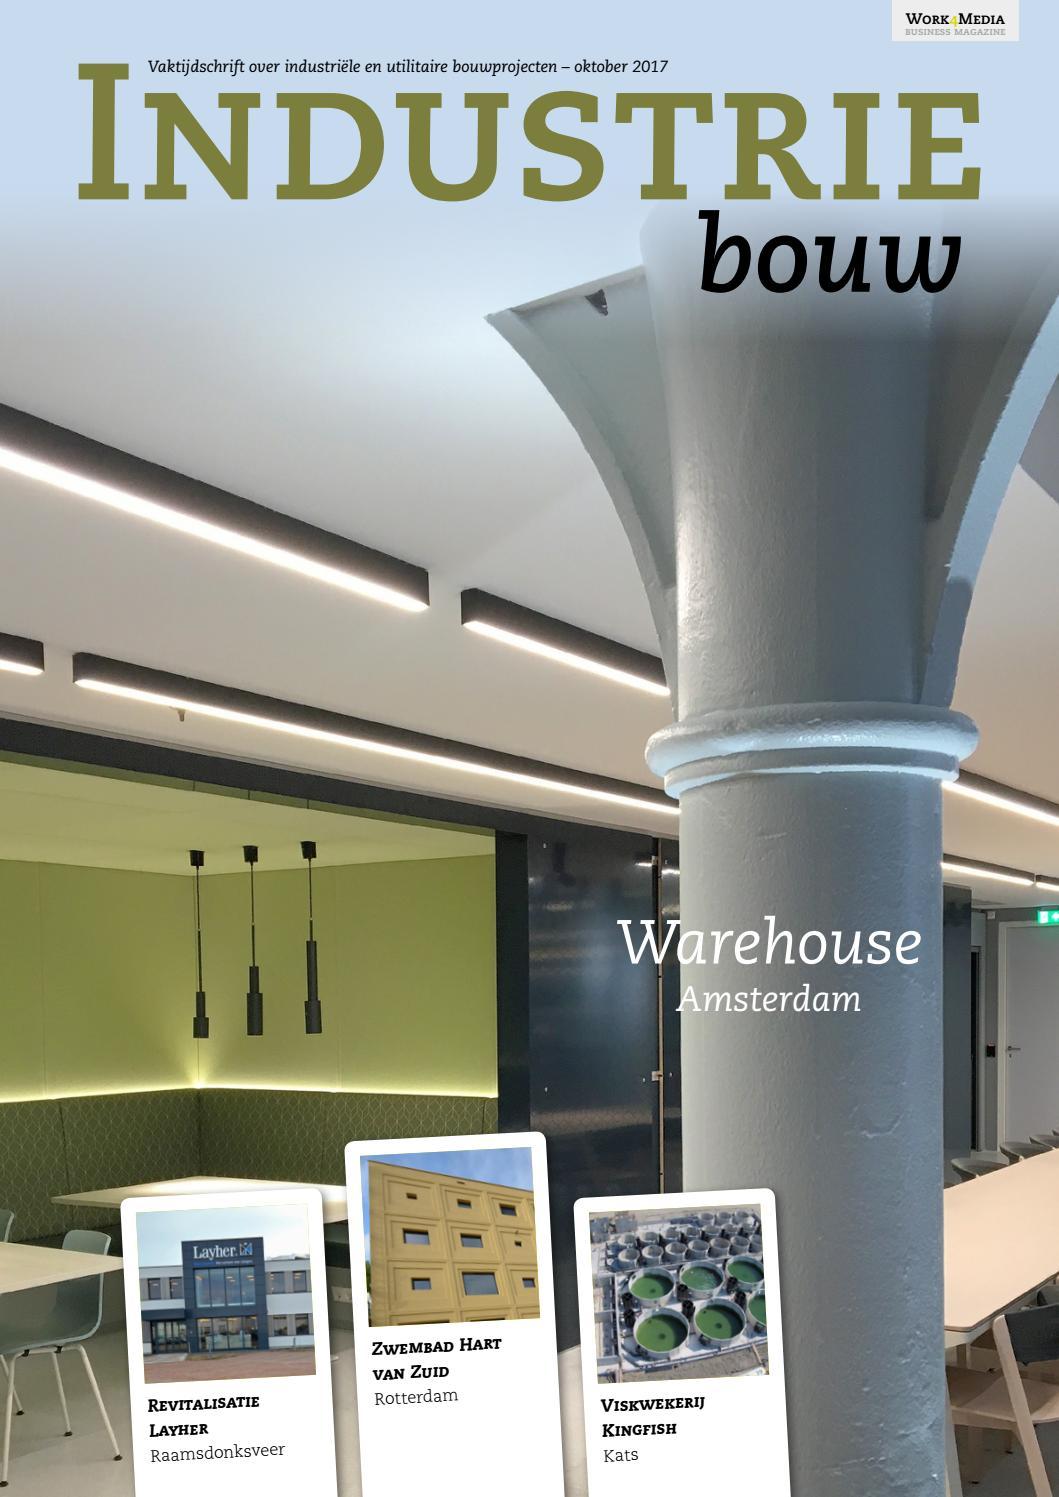 efe269da1c9 Industriebouw Oktober 2017 by Work4Media - issuu